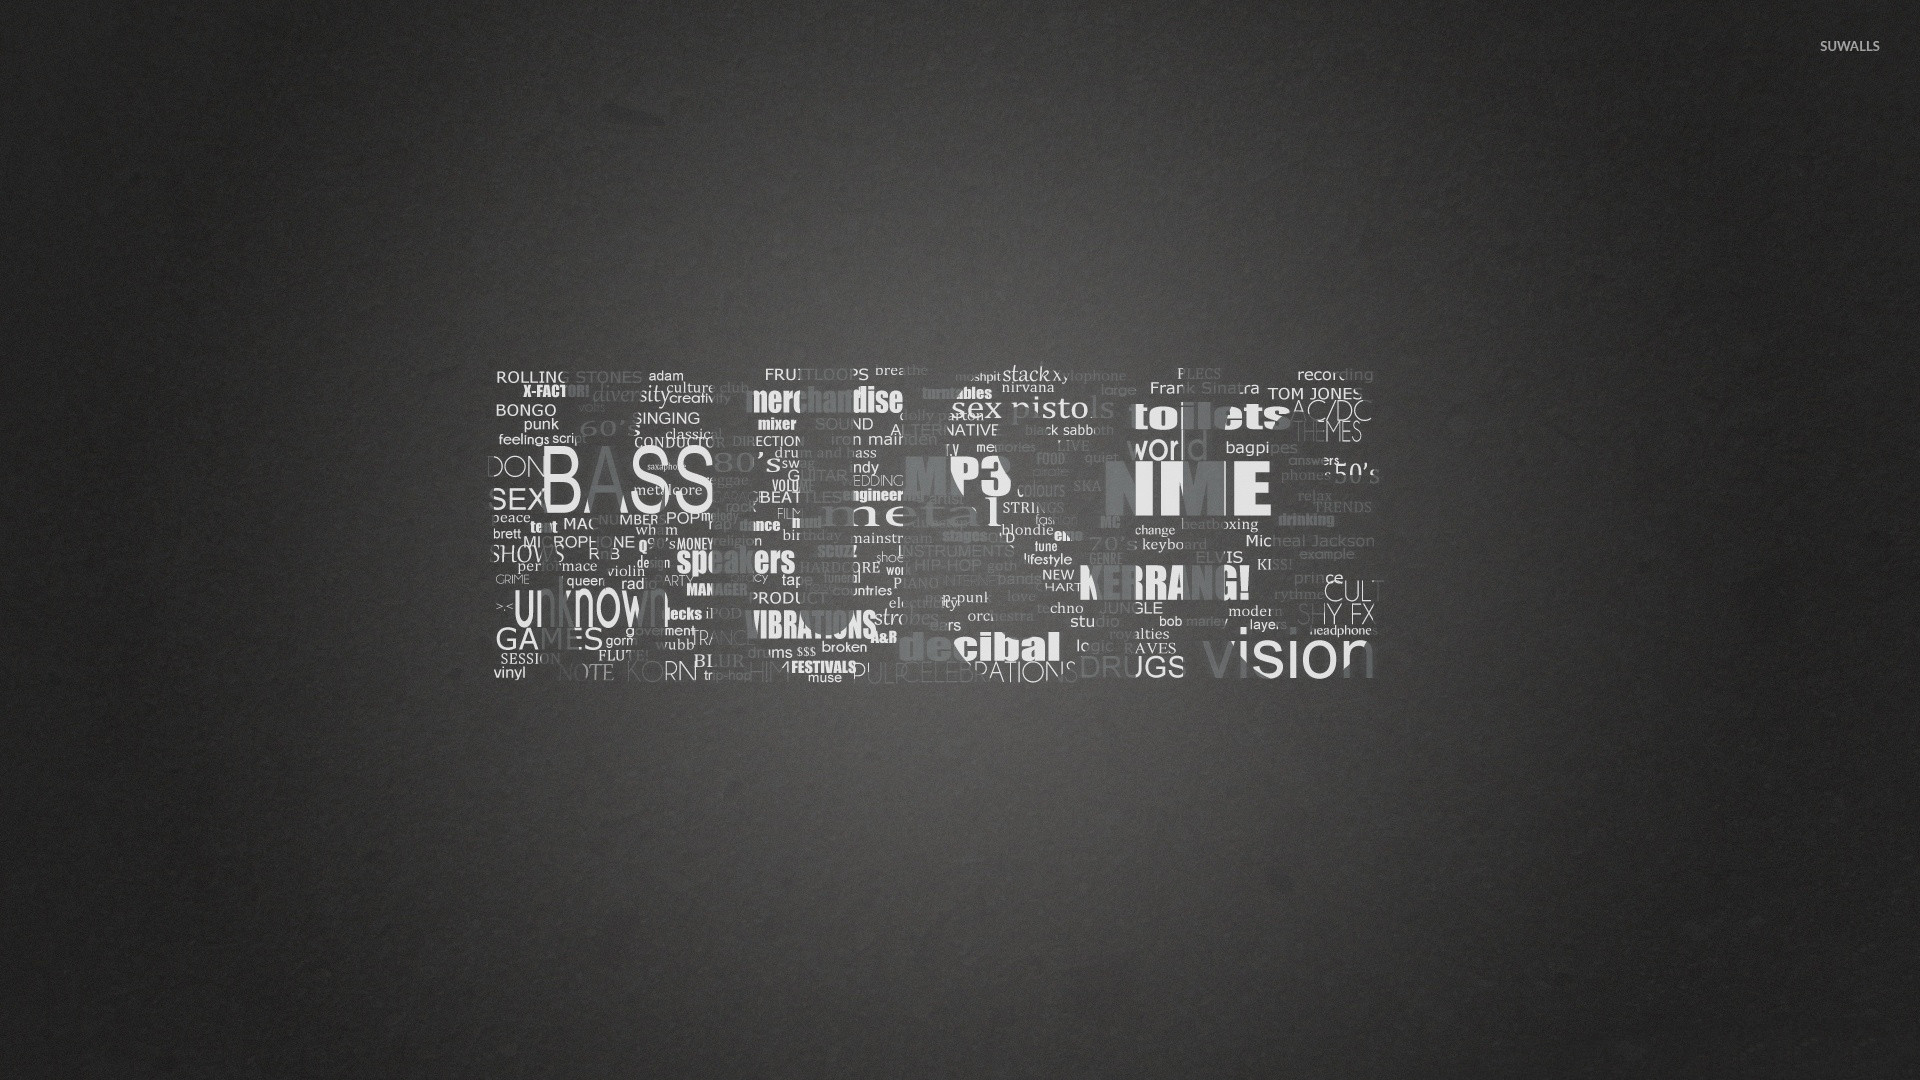 Black and white music genres wallpaper jpg